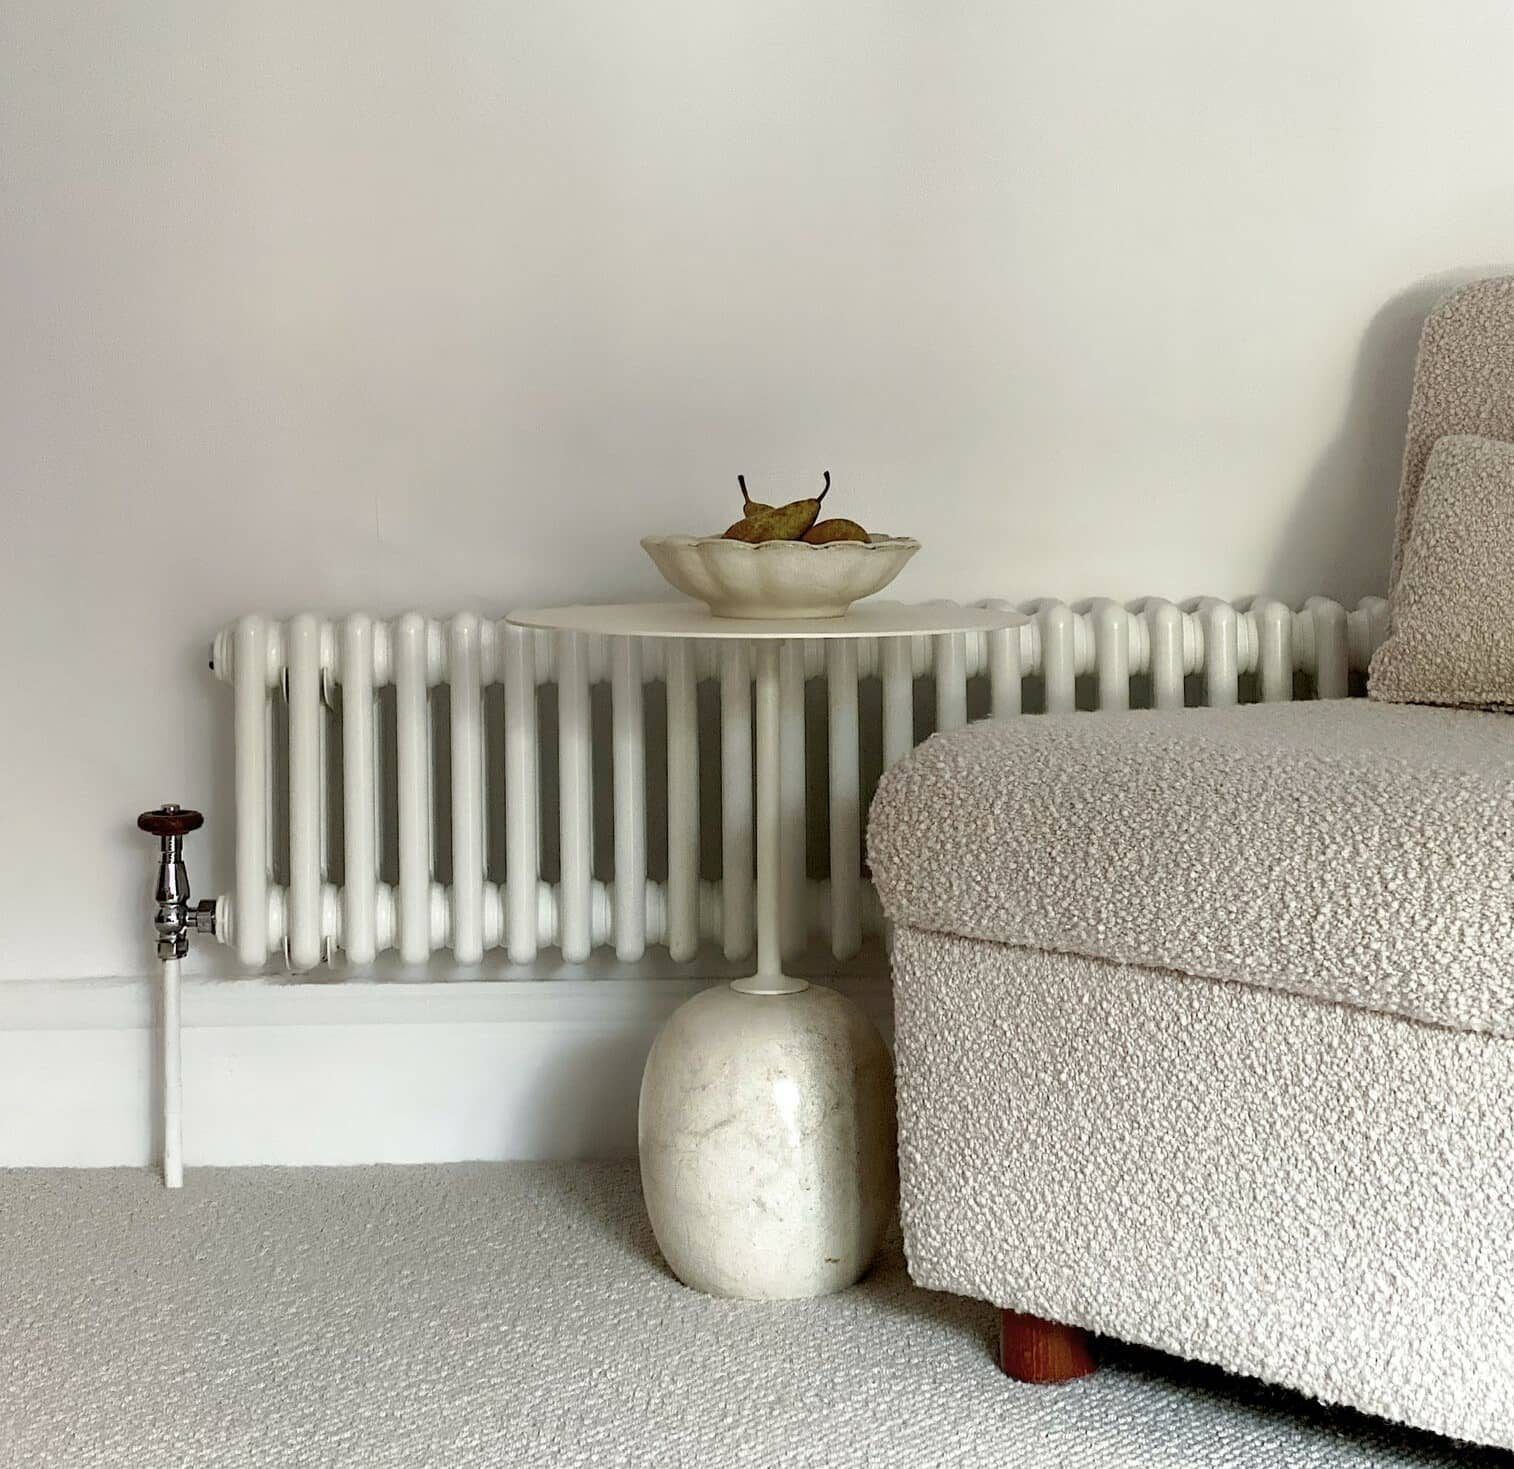 Donna's living room radiator